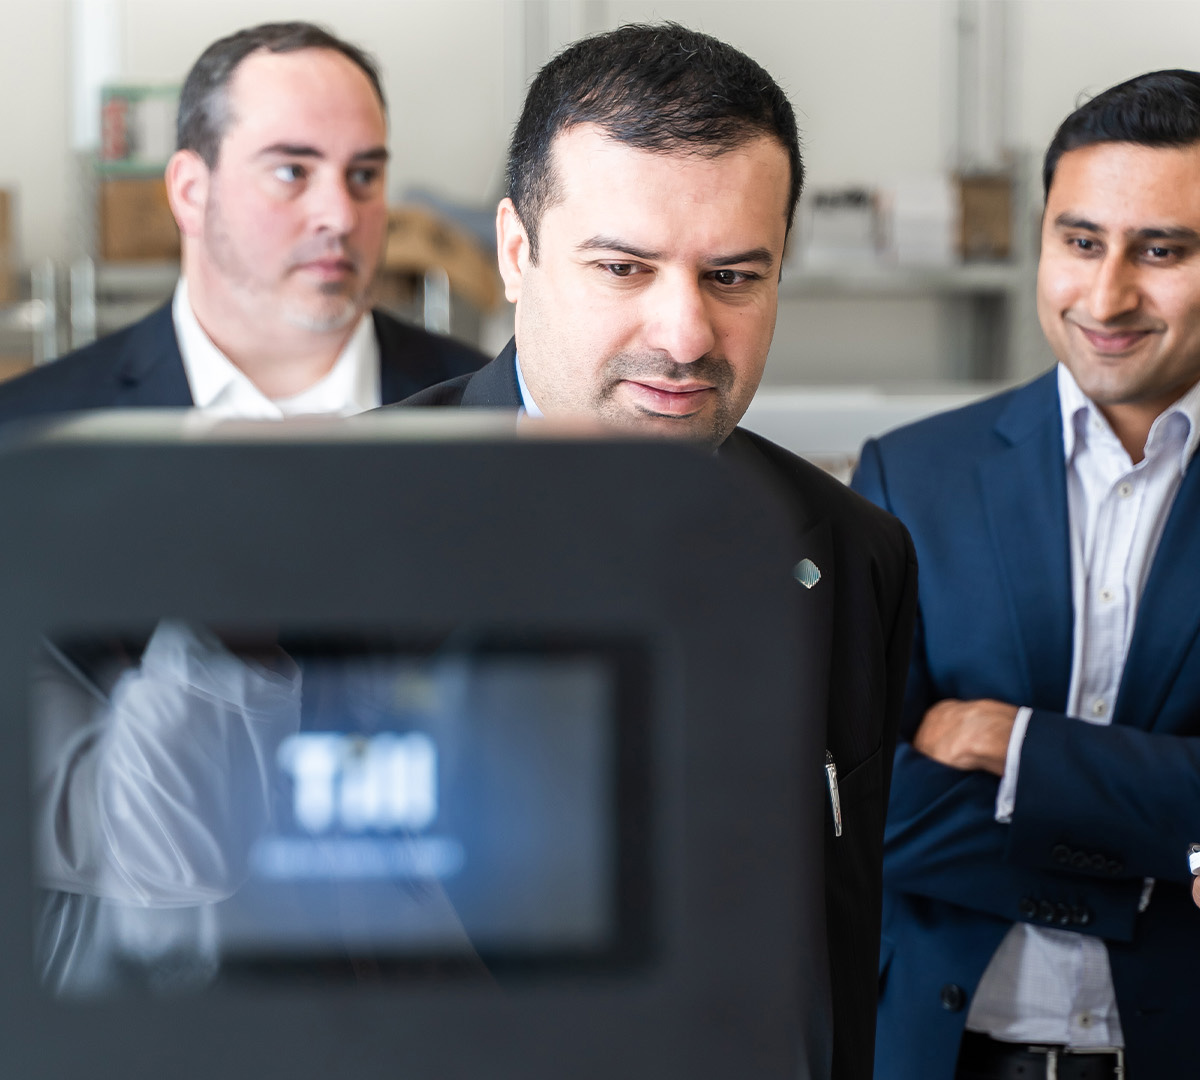 From L-R: Till Payments Development Manager Richard Lane, CEO of the Dubai Blockchain Centre Dr Marwan Alzarouni and Austrade Senior Adviser, Services & Technology Gaurav Johri inspect a Till product